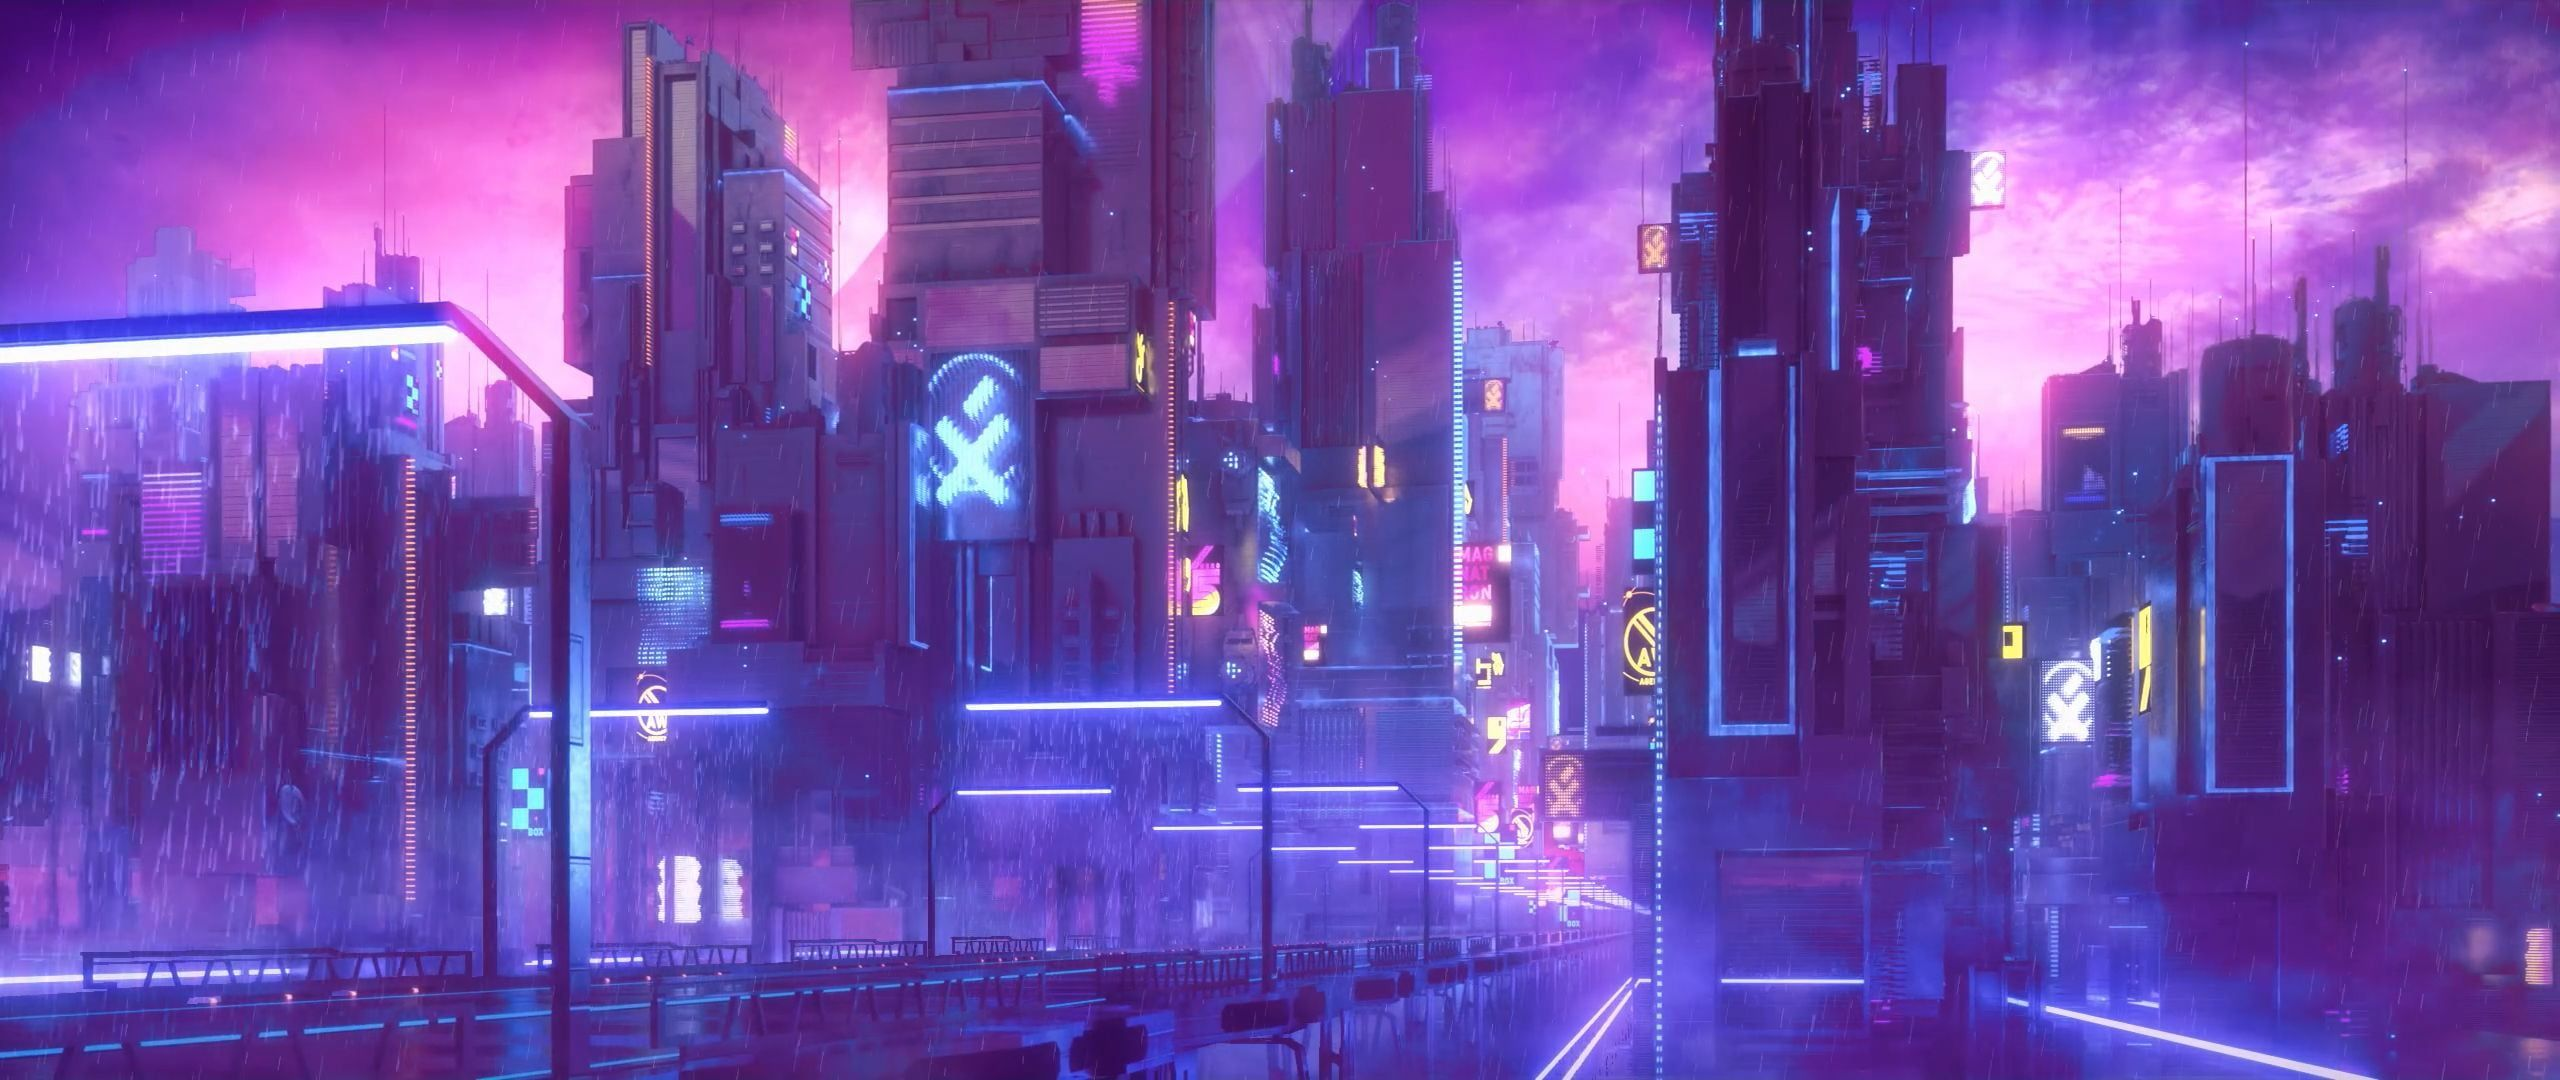 city animated digital wallpaper cyberpunk neon 2K